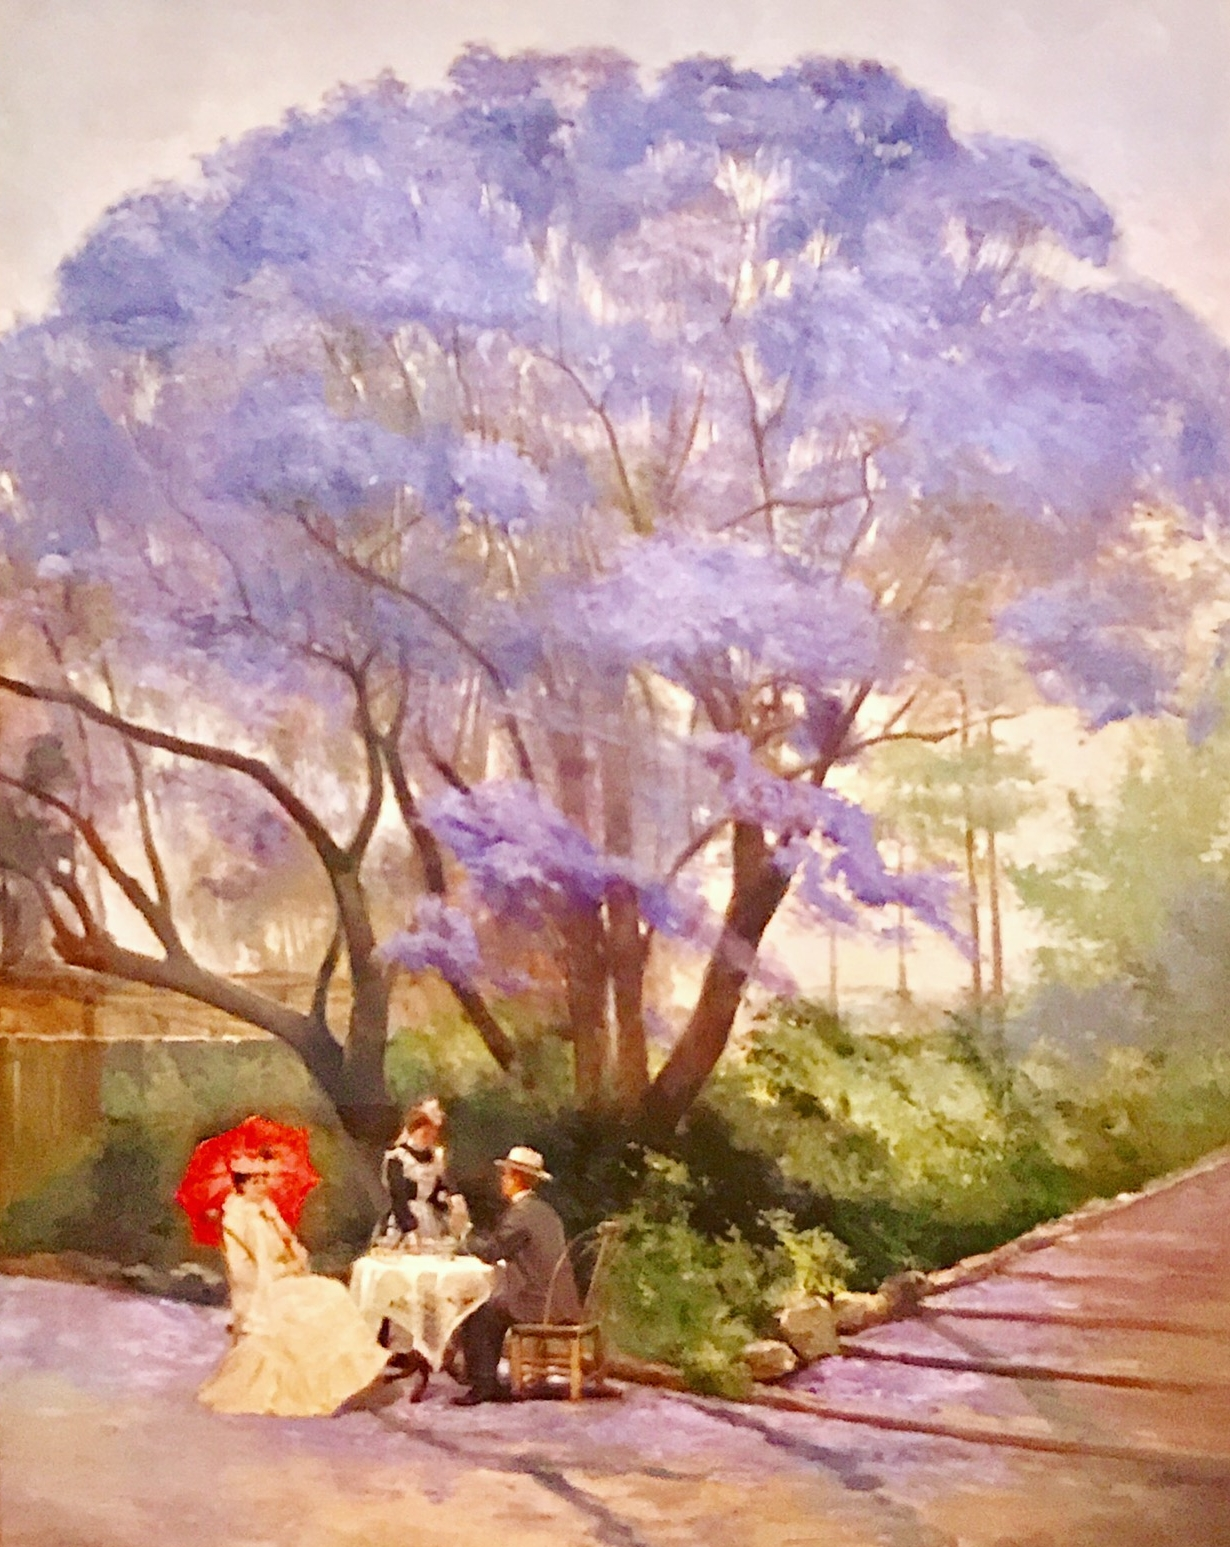 Under the Jacaranda, Godfrey Rivers, 1903.